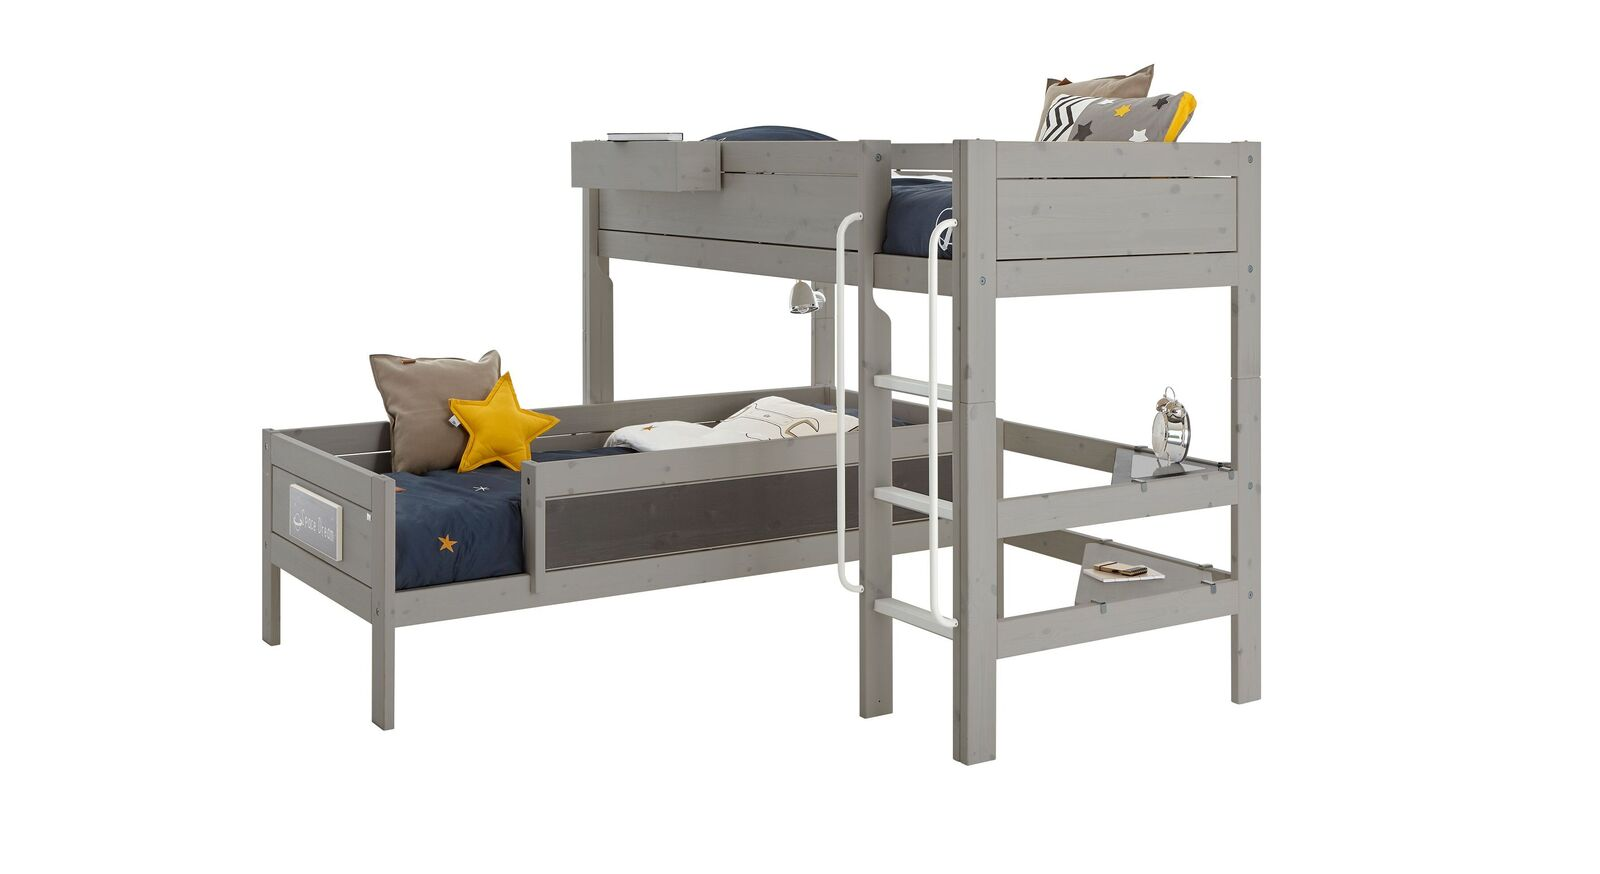 LIFETIME Eck-Etagenbett Original aus grau lasiertem Holz